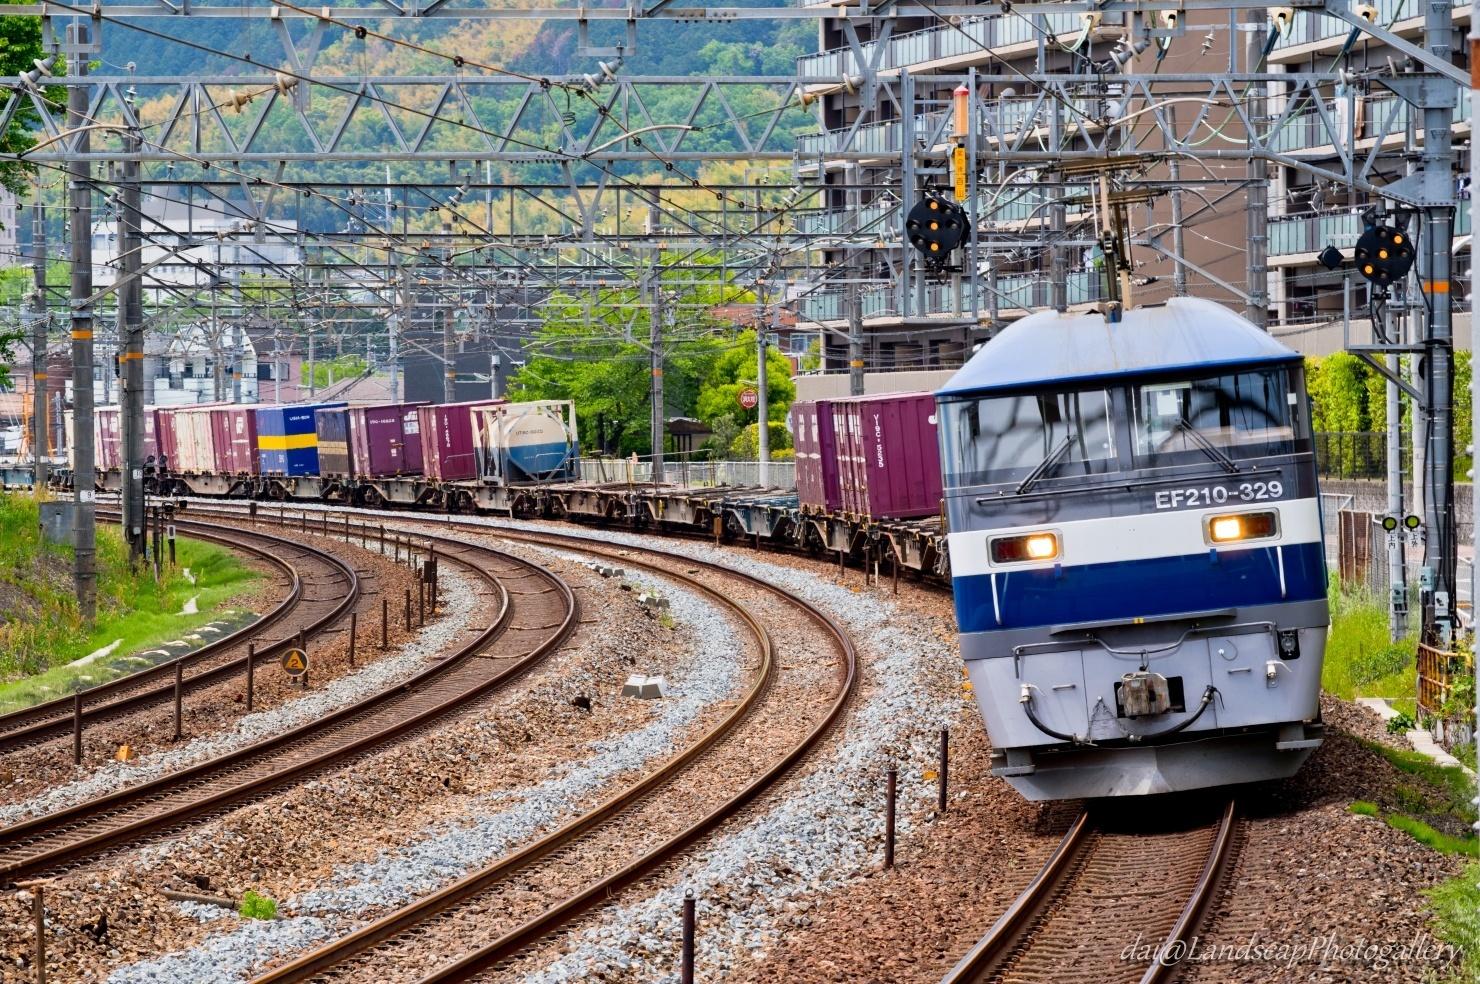 EF210-329 コンテナ列車